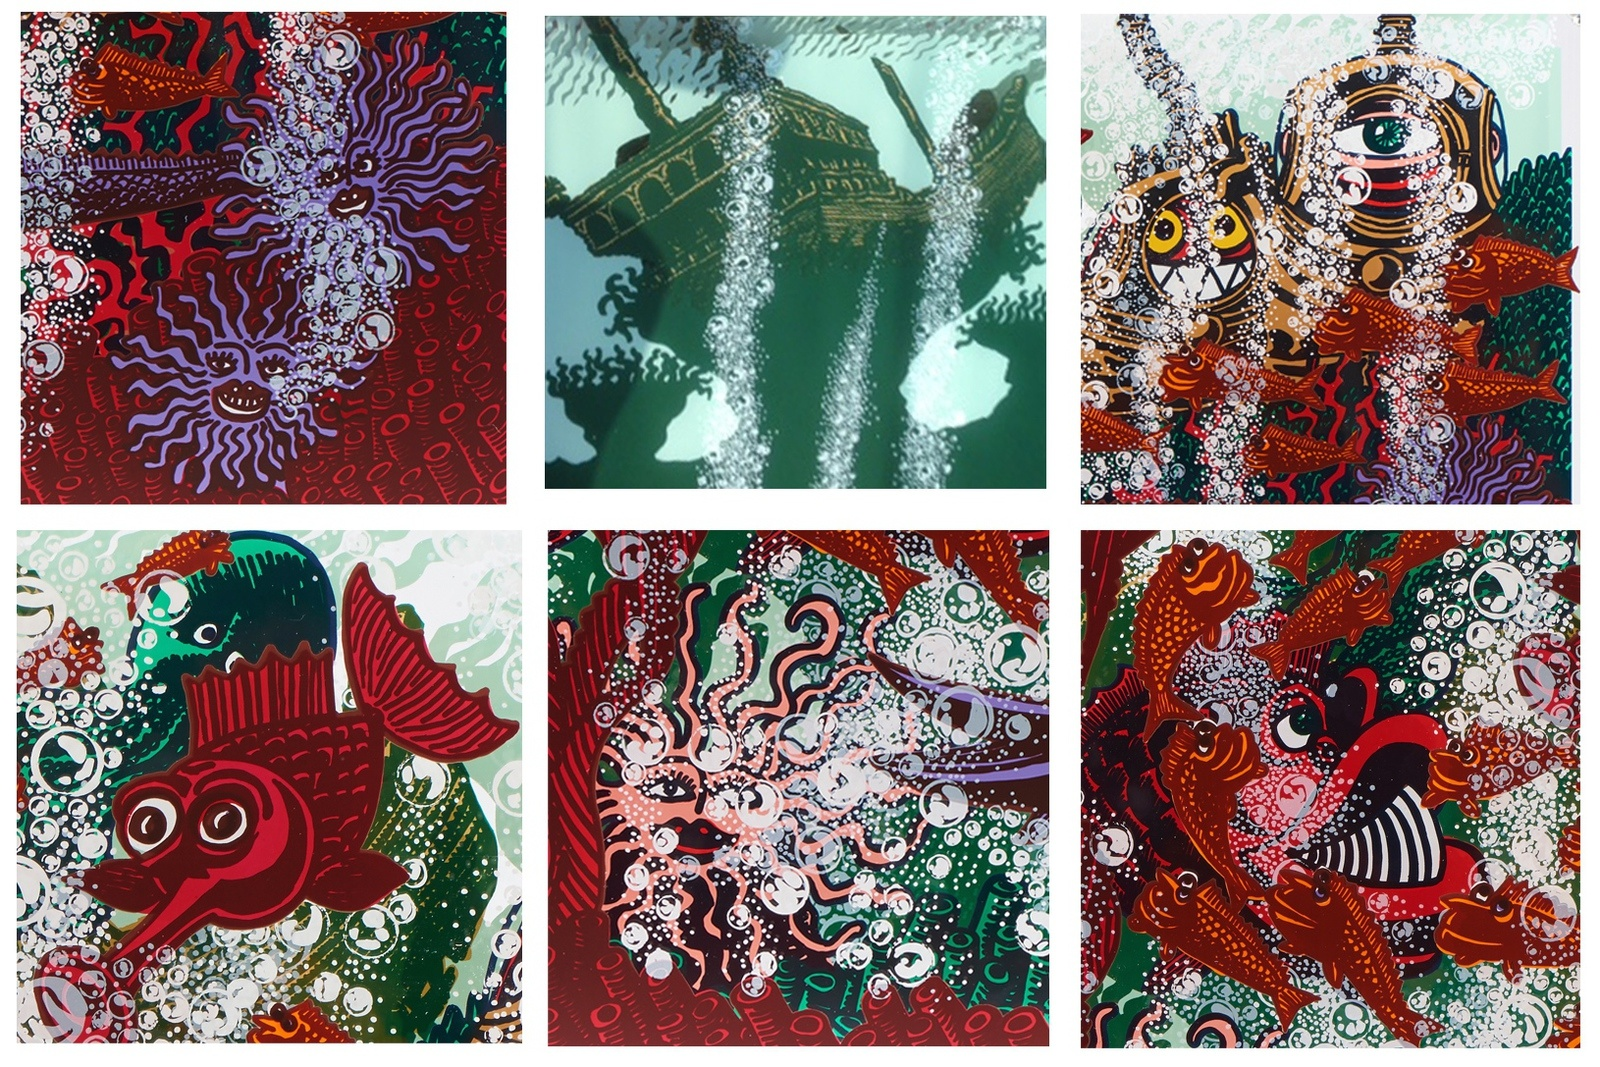 L'aquarium - 2015 - Acrylique sur plexiglas - 60x80x15cm